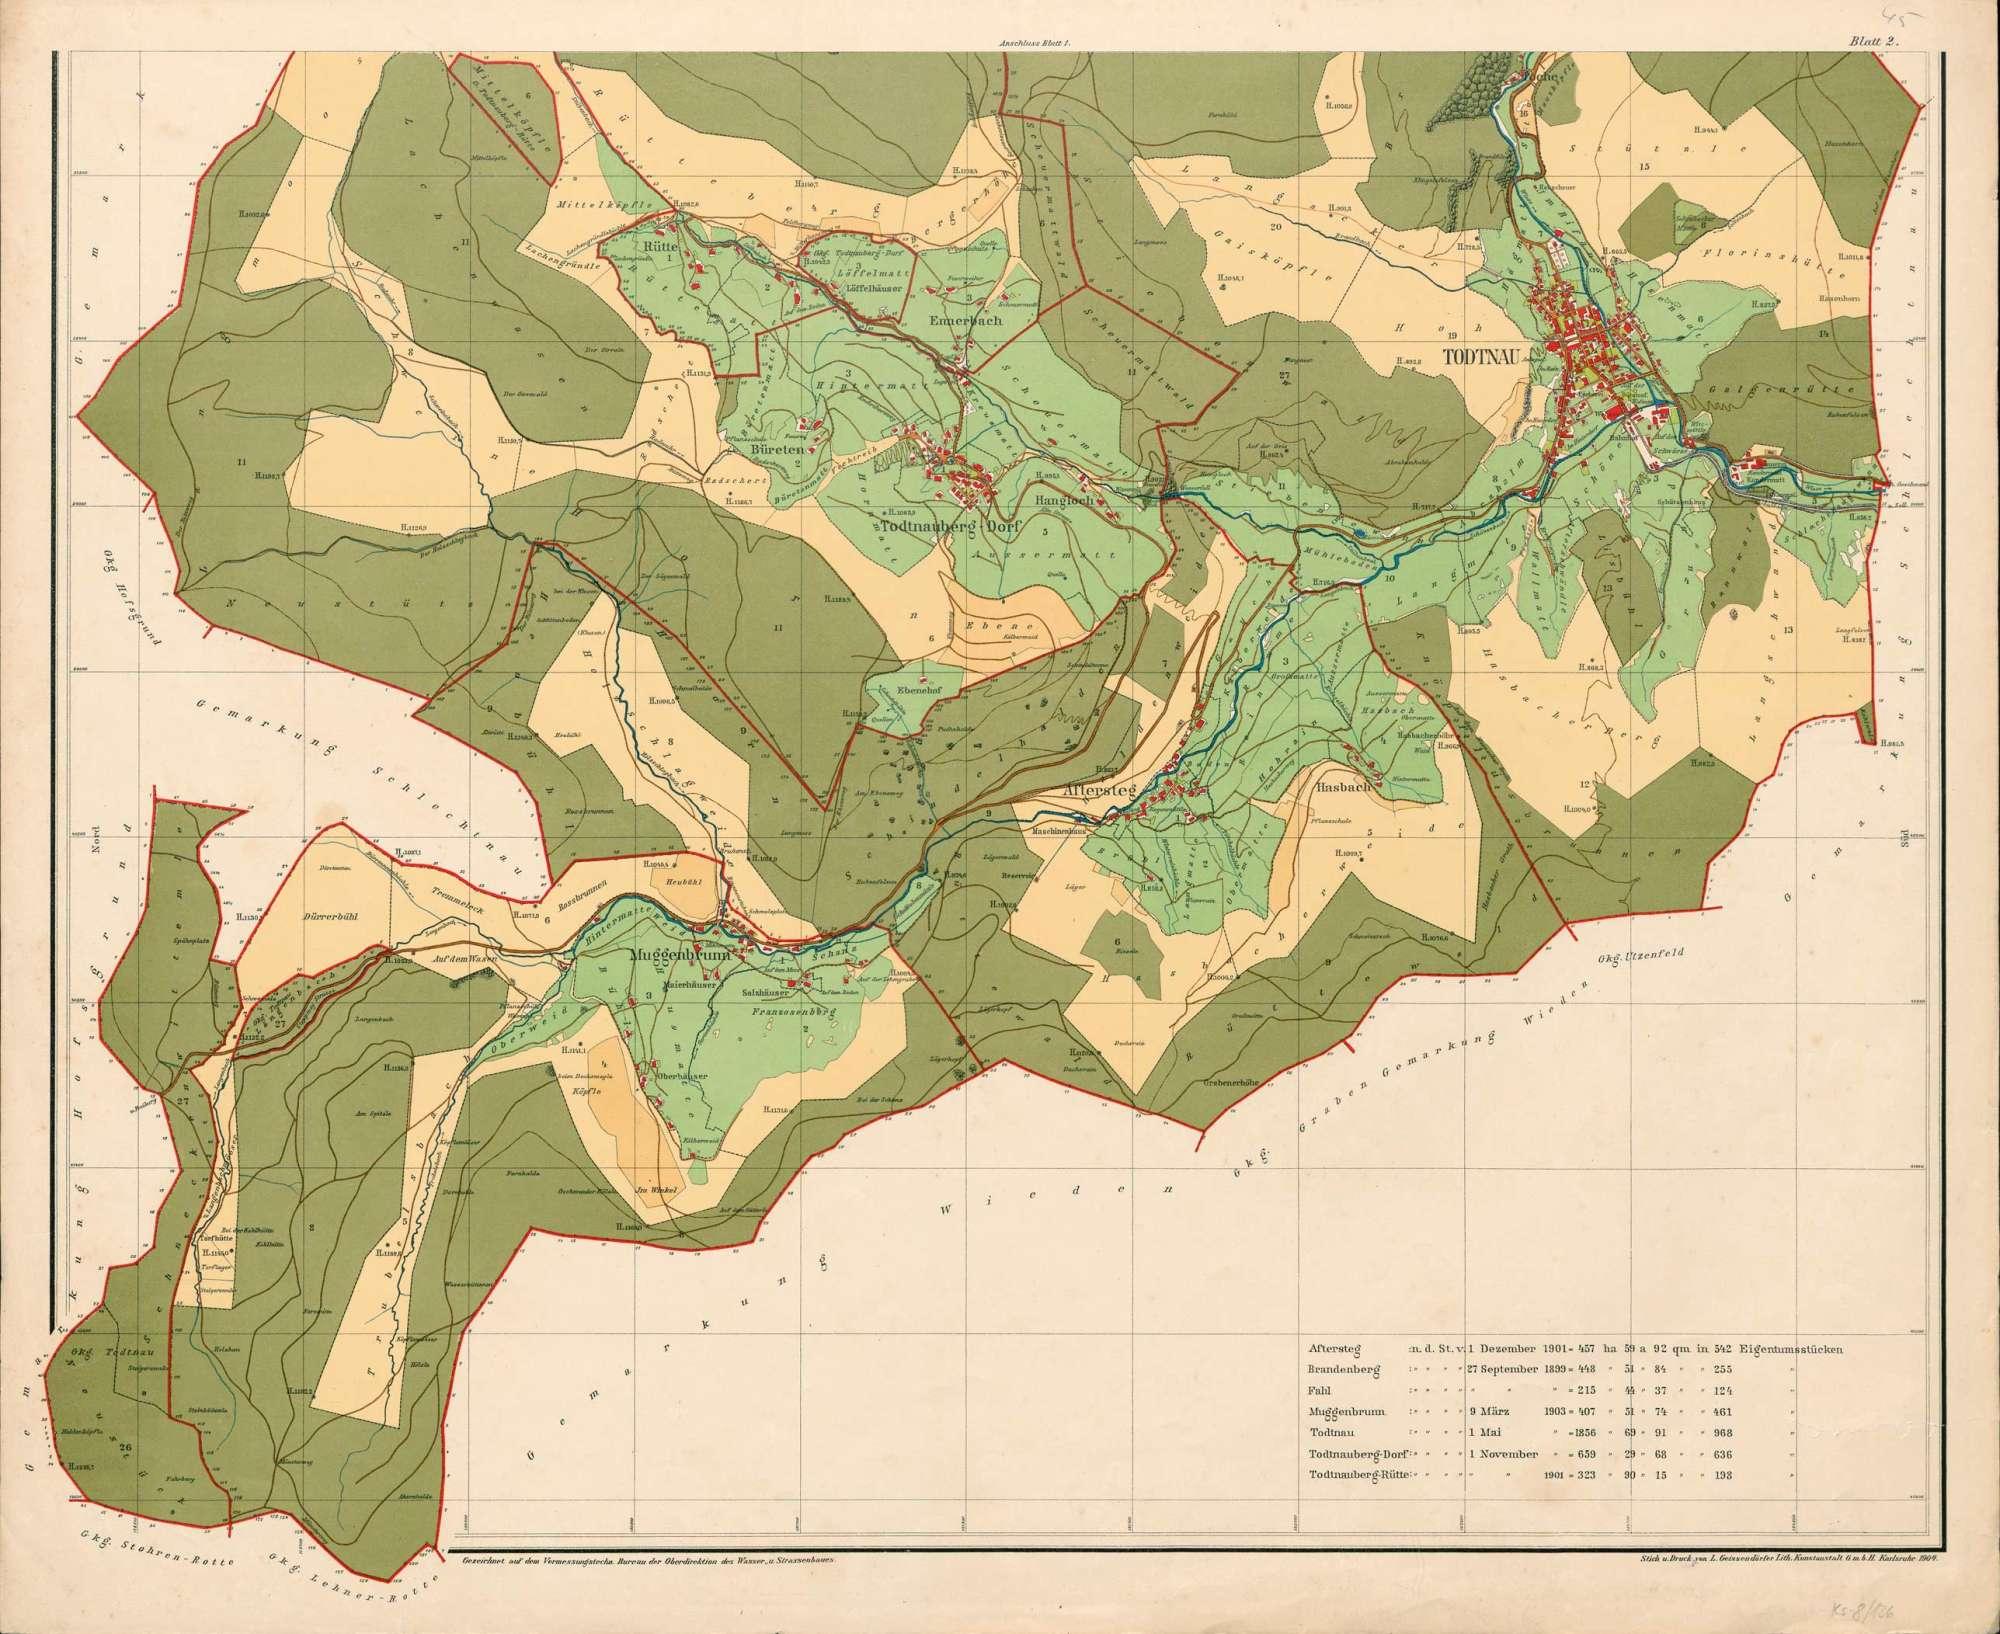 Aftersteg; Brandenberg; Fahl; Muggenbrunn; Todtnau; Todtnauberg (Todtnauberg-Dorf und Todtnauberg-Rütte), Bild 1